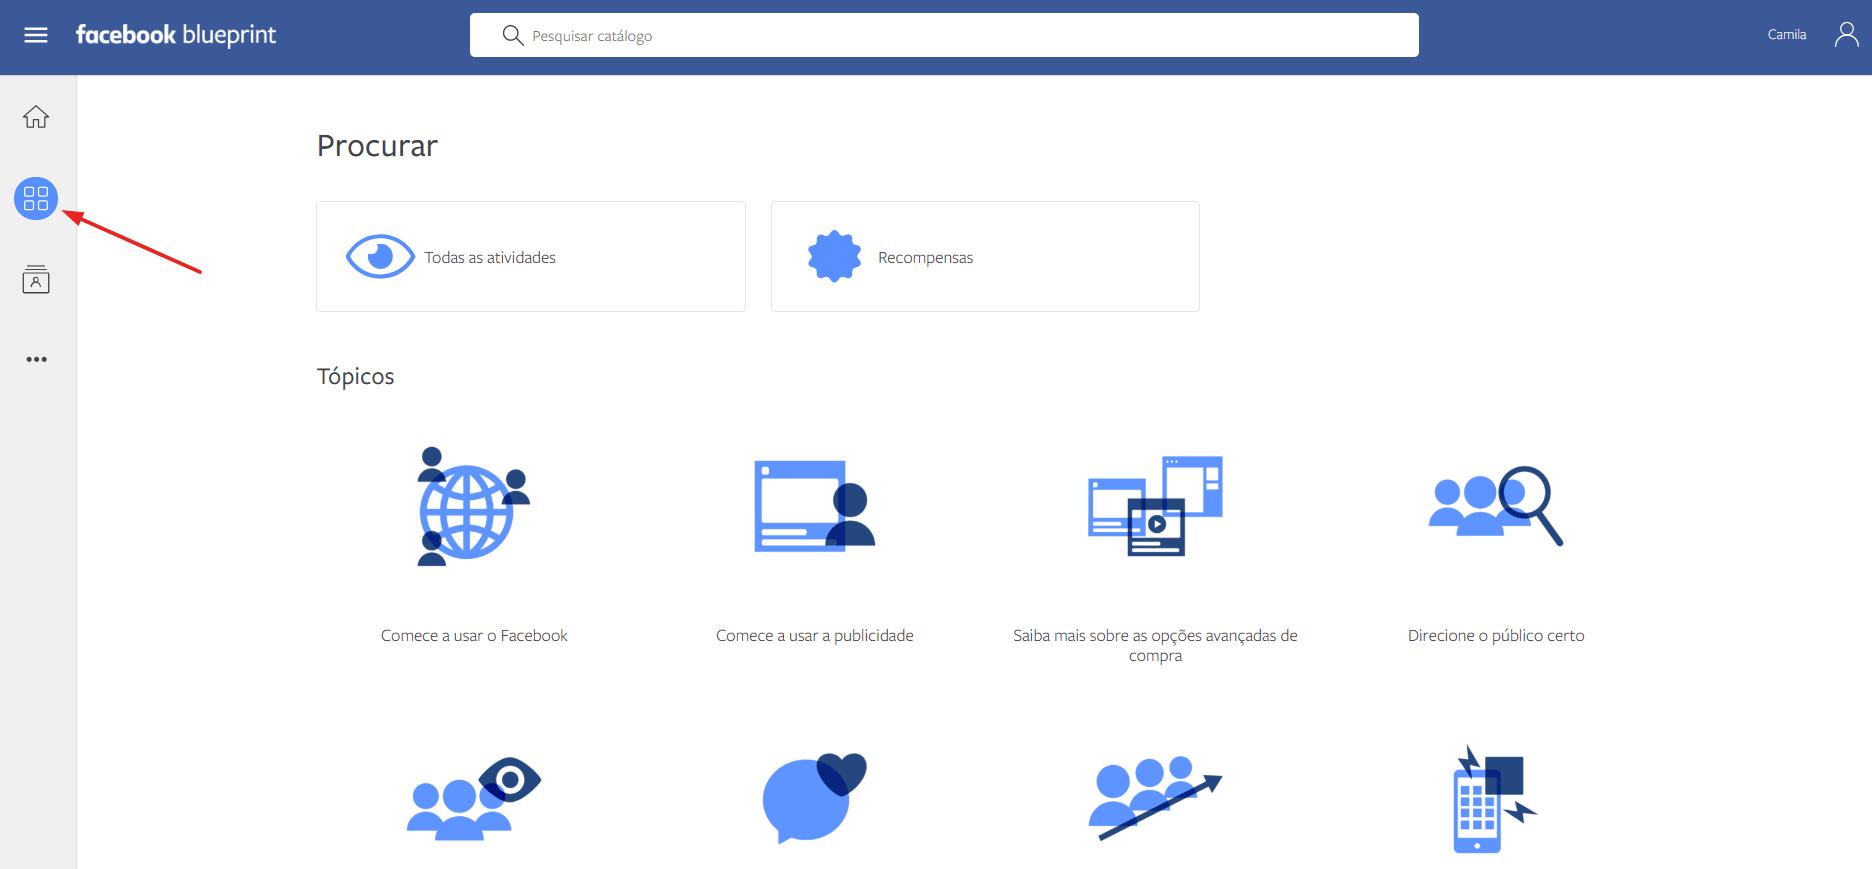 cursos facebook blueprint